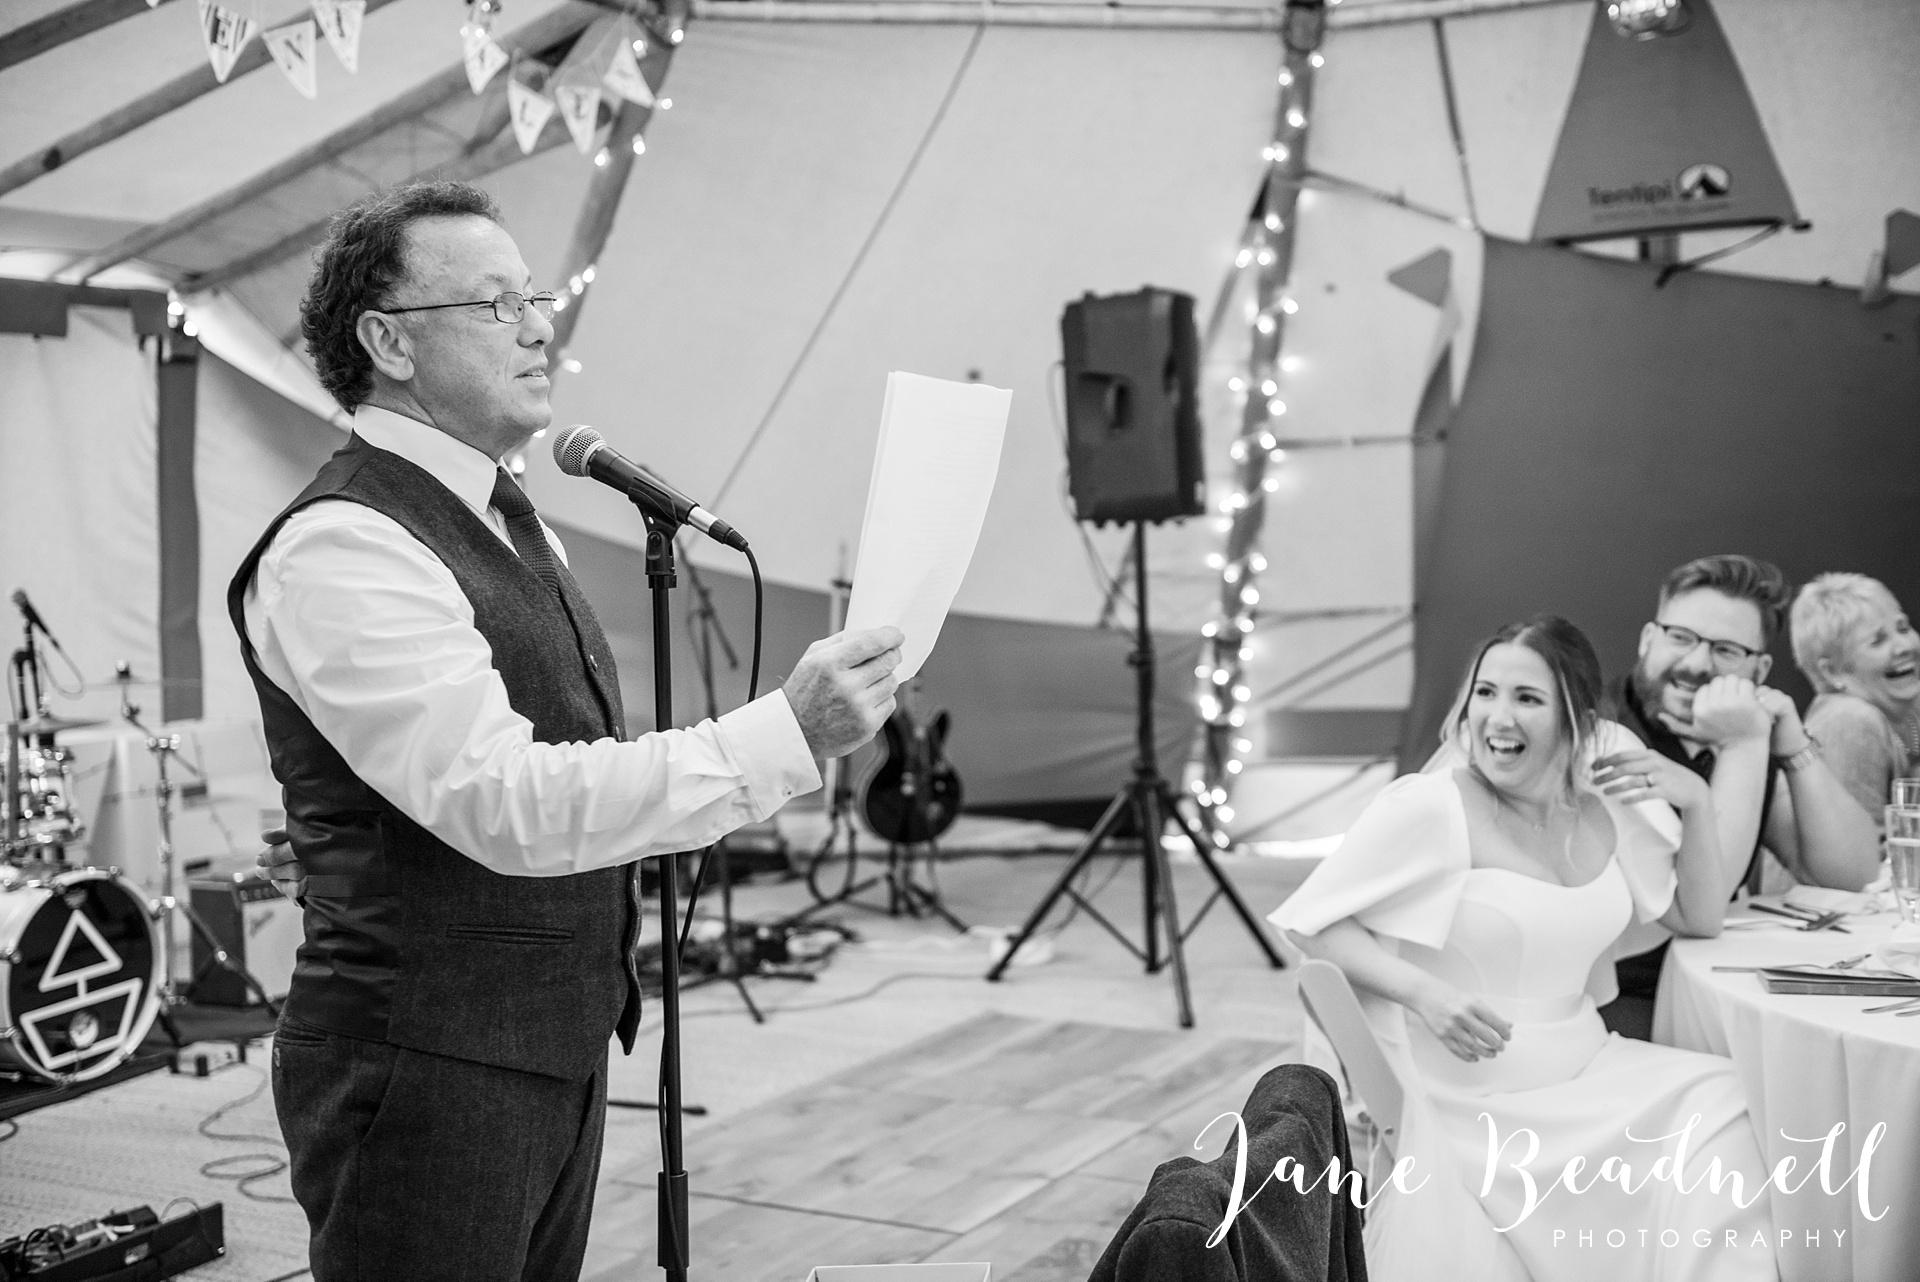 fine-art-wedding-photographer-jane-beadnell-yorkshire-wedding-photographer_0134